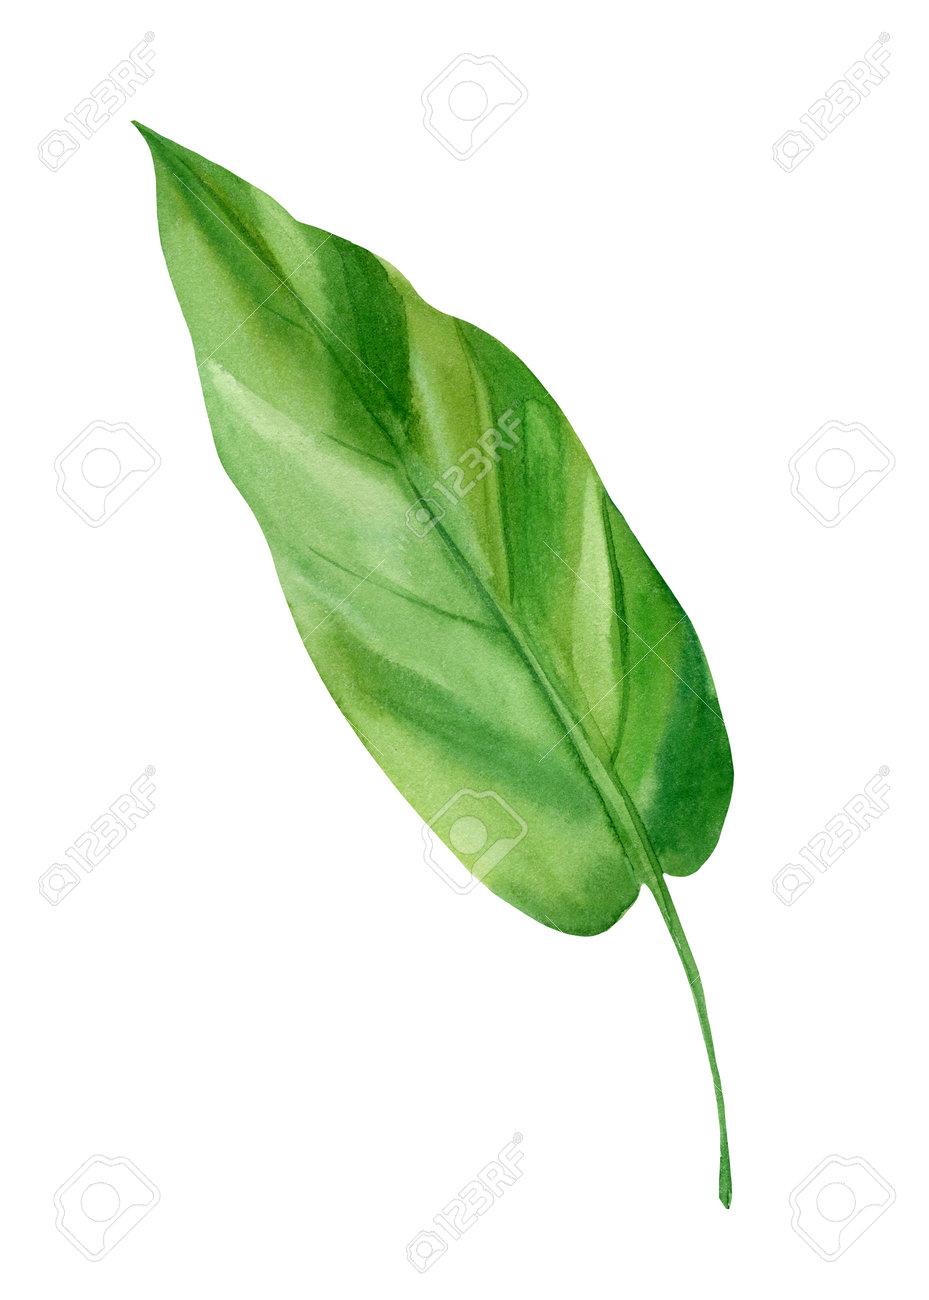 флора зеленый